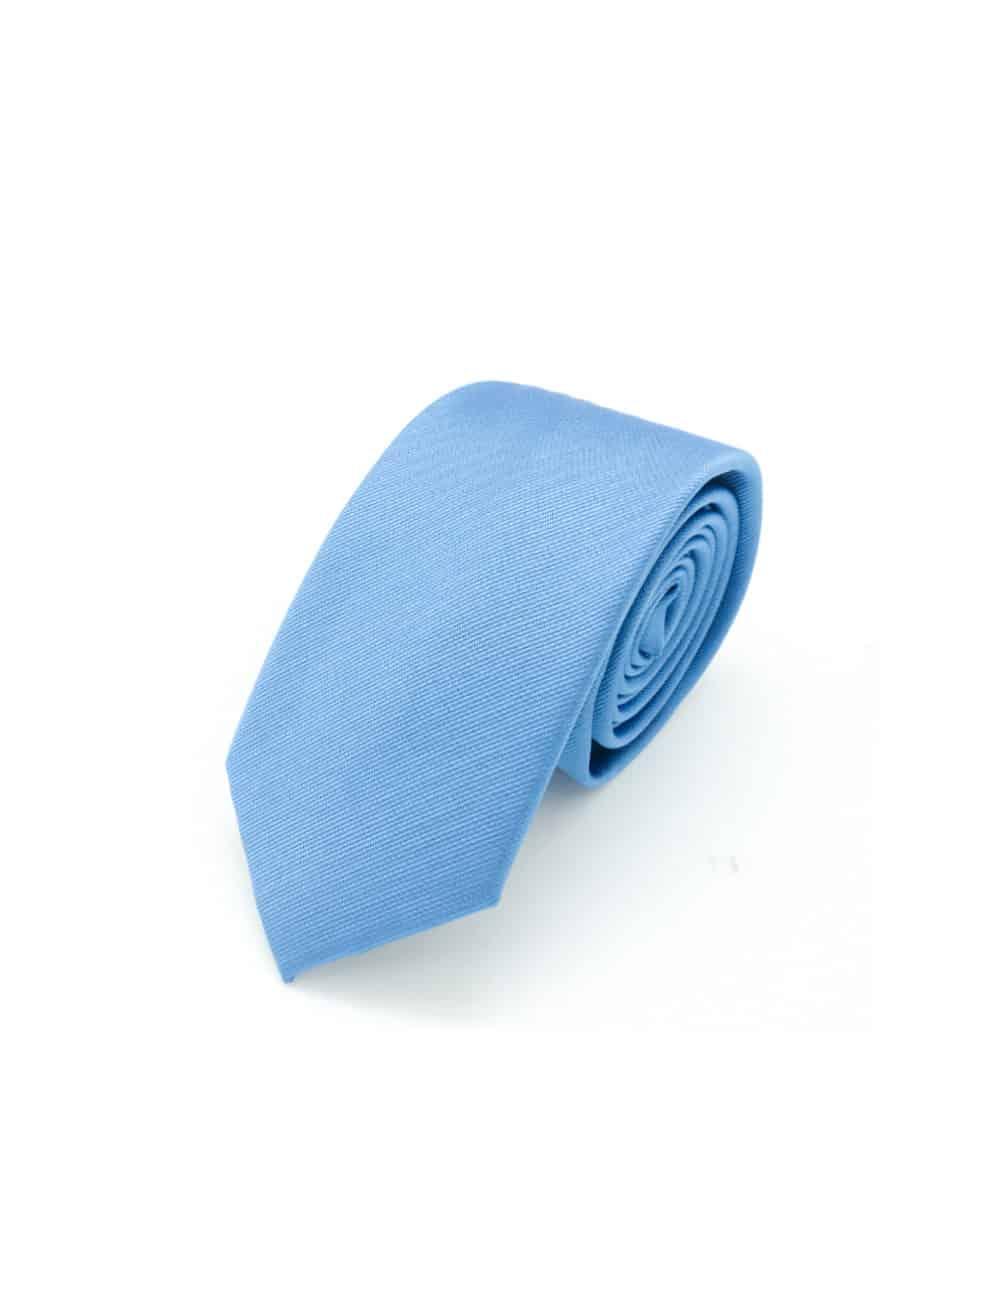 Solid Water Blue Woven Necktie NT99.8